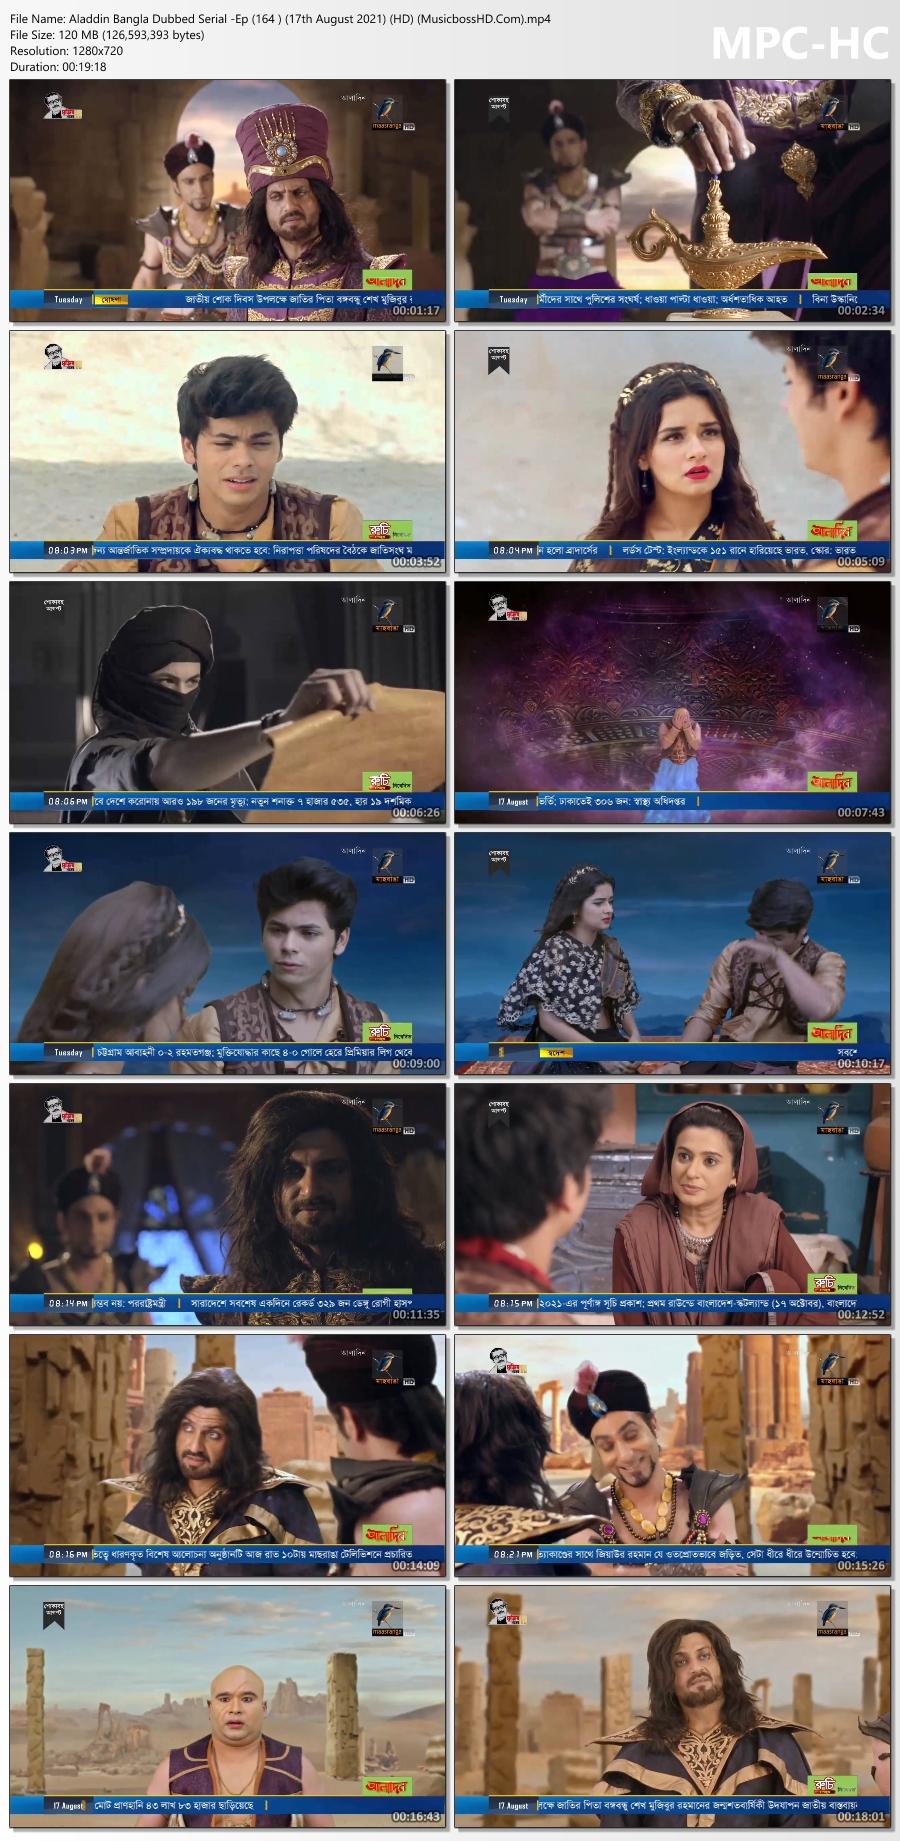 Aladdin-Bangla-Dubbed-Serial-Ep-164-17th-August-2021-HD-Musicboss-HD-Com-mp4-thumbs